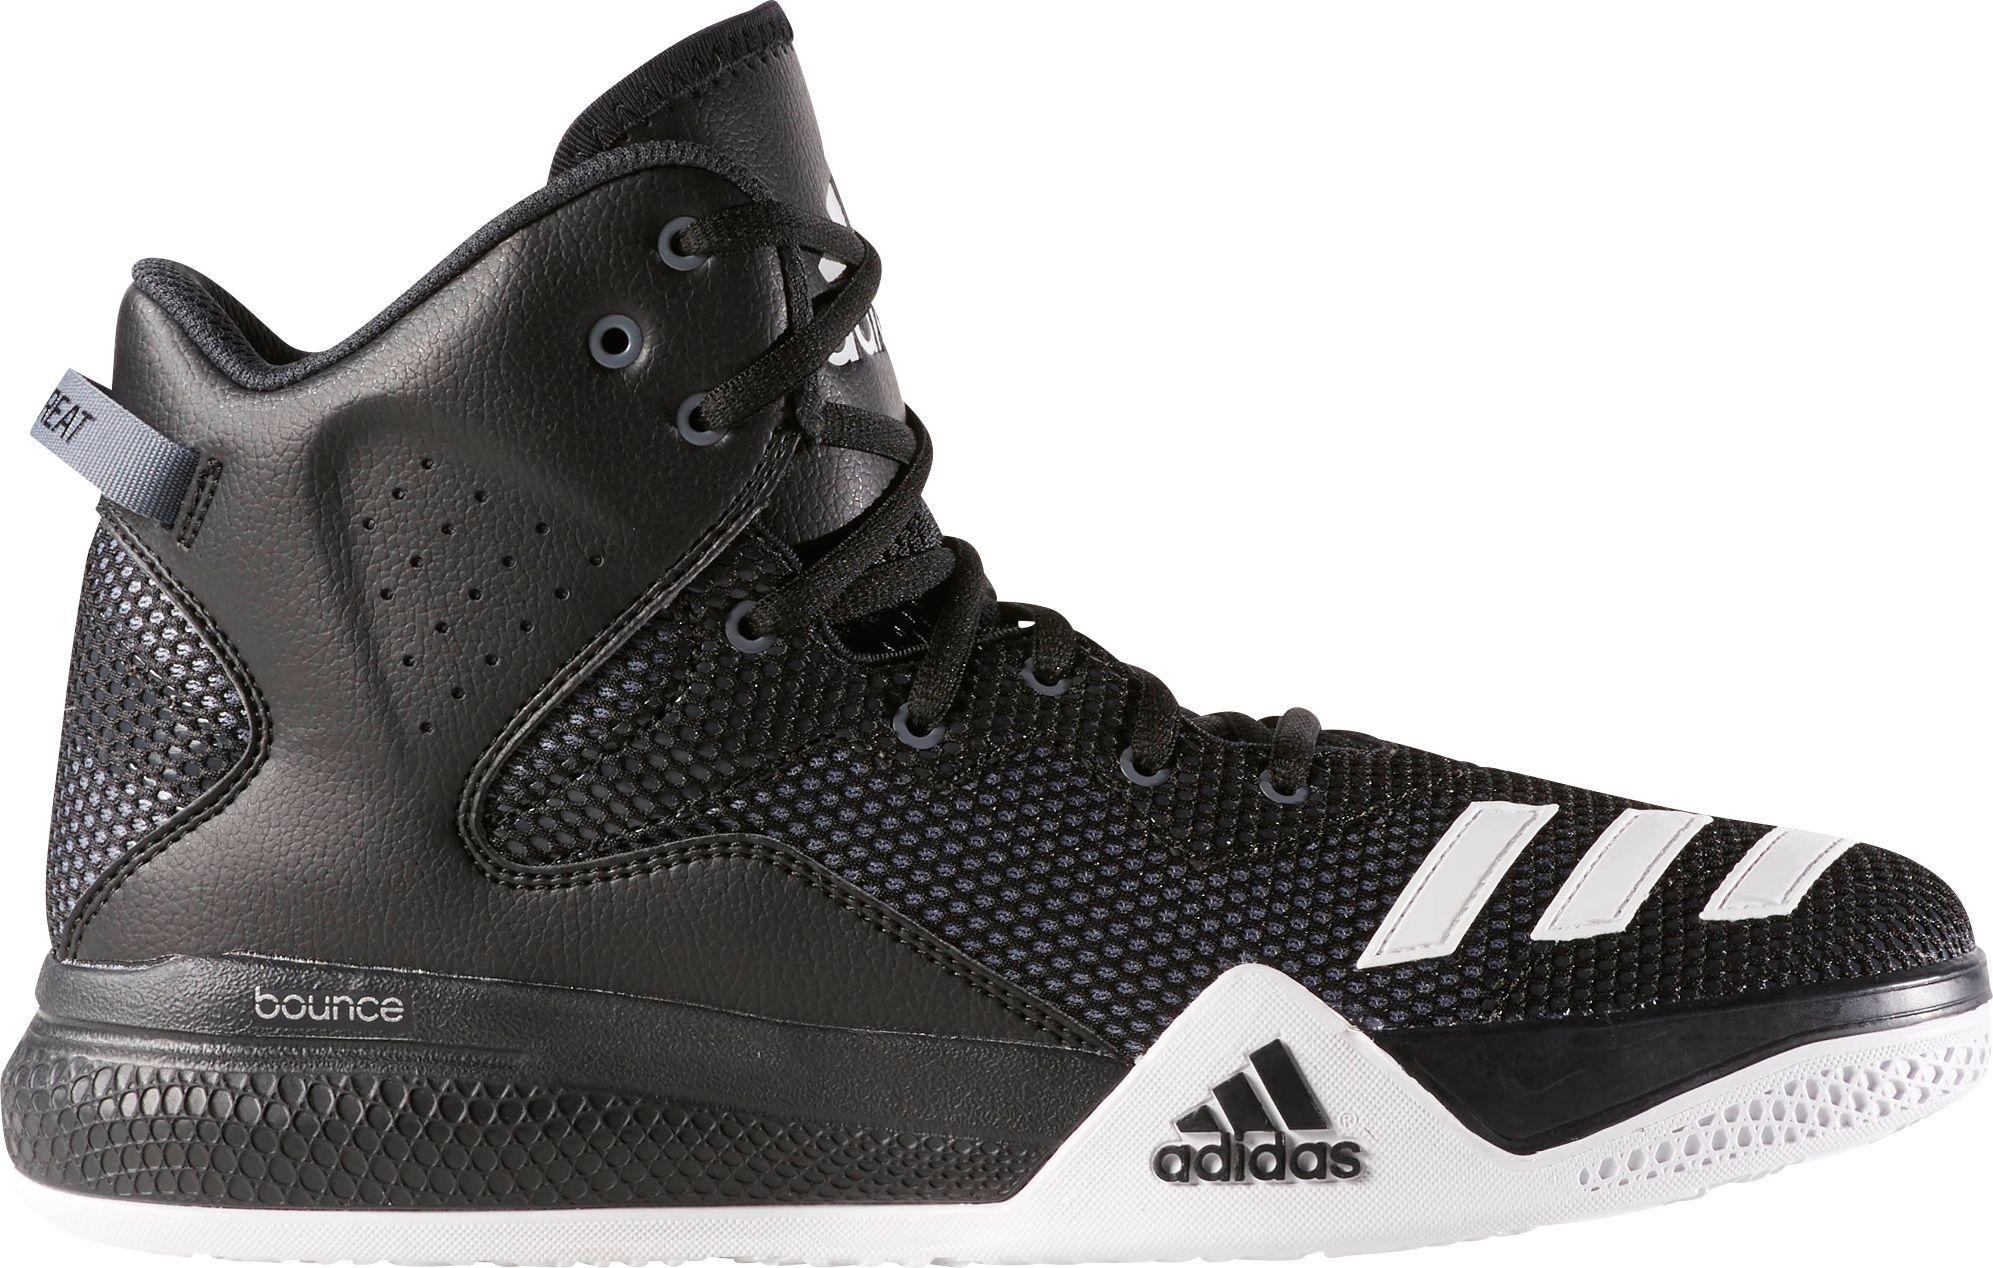 adidas dual threat basketball shoes 096a55